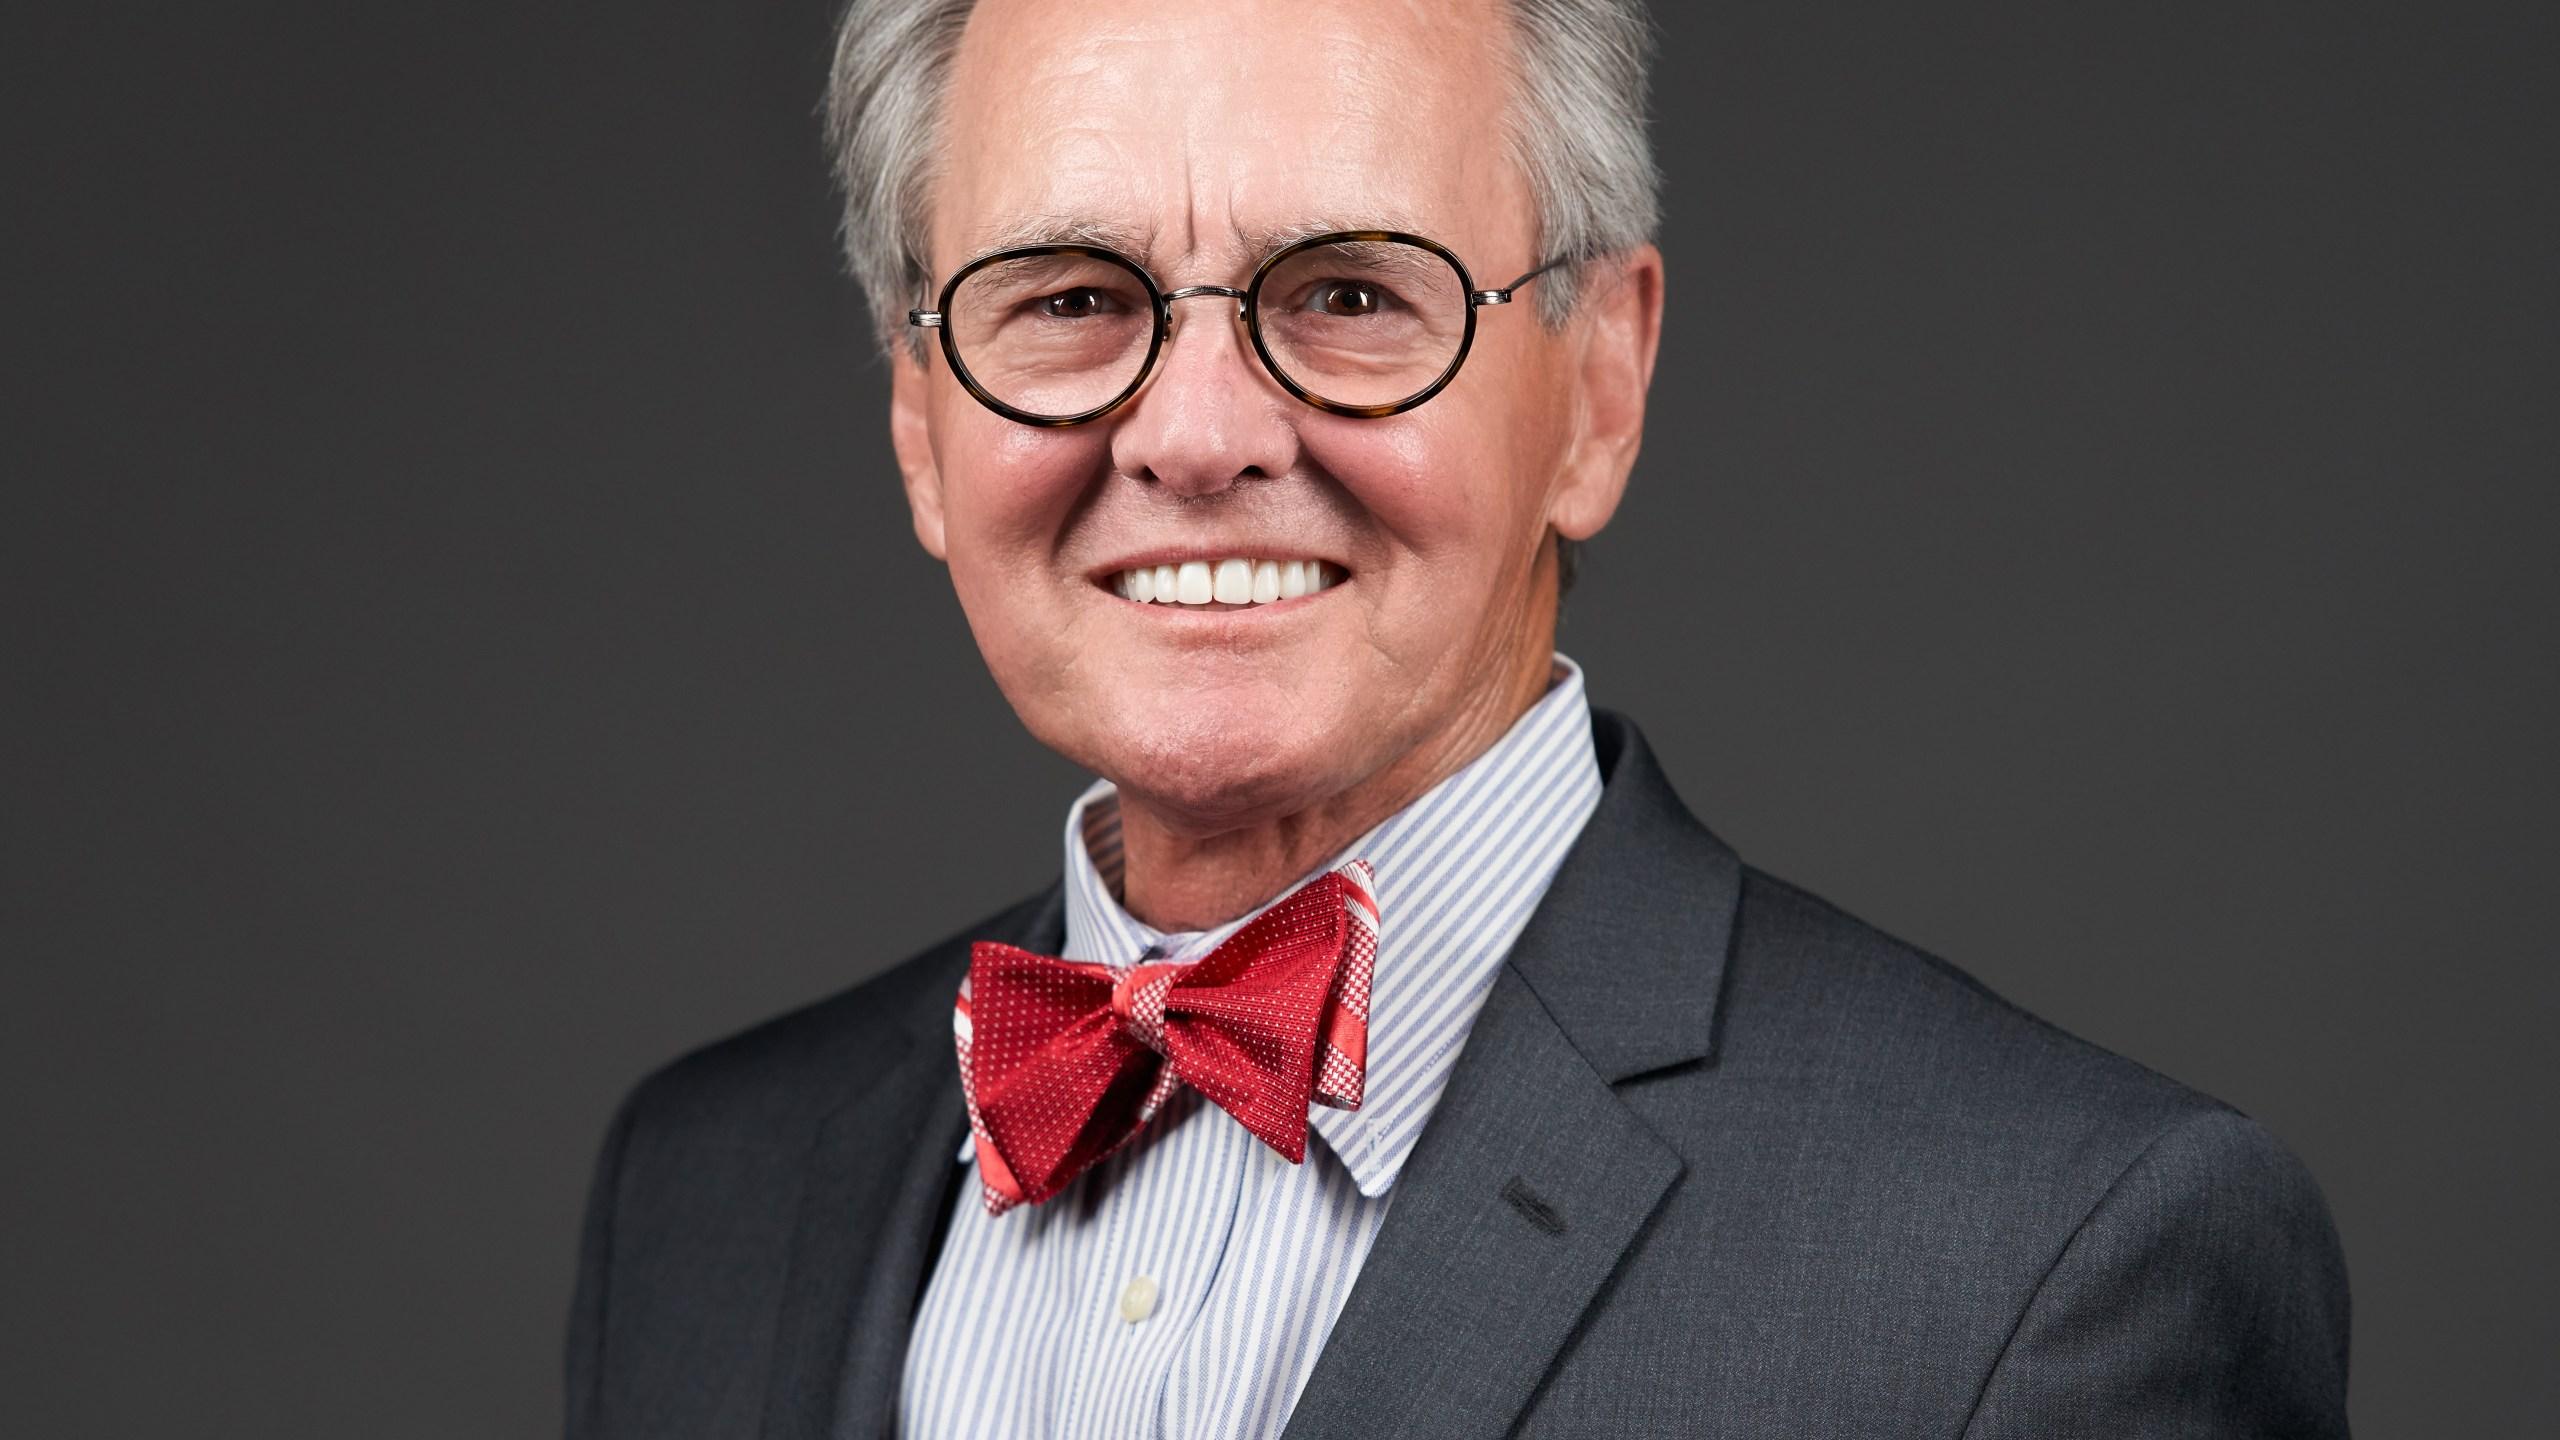 Dennis Wade